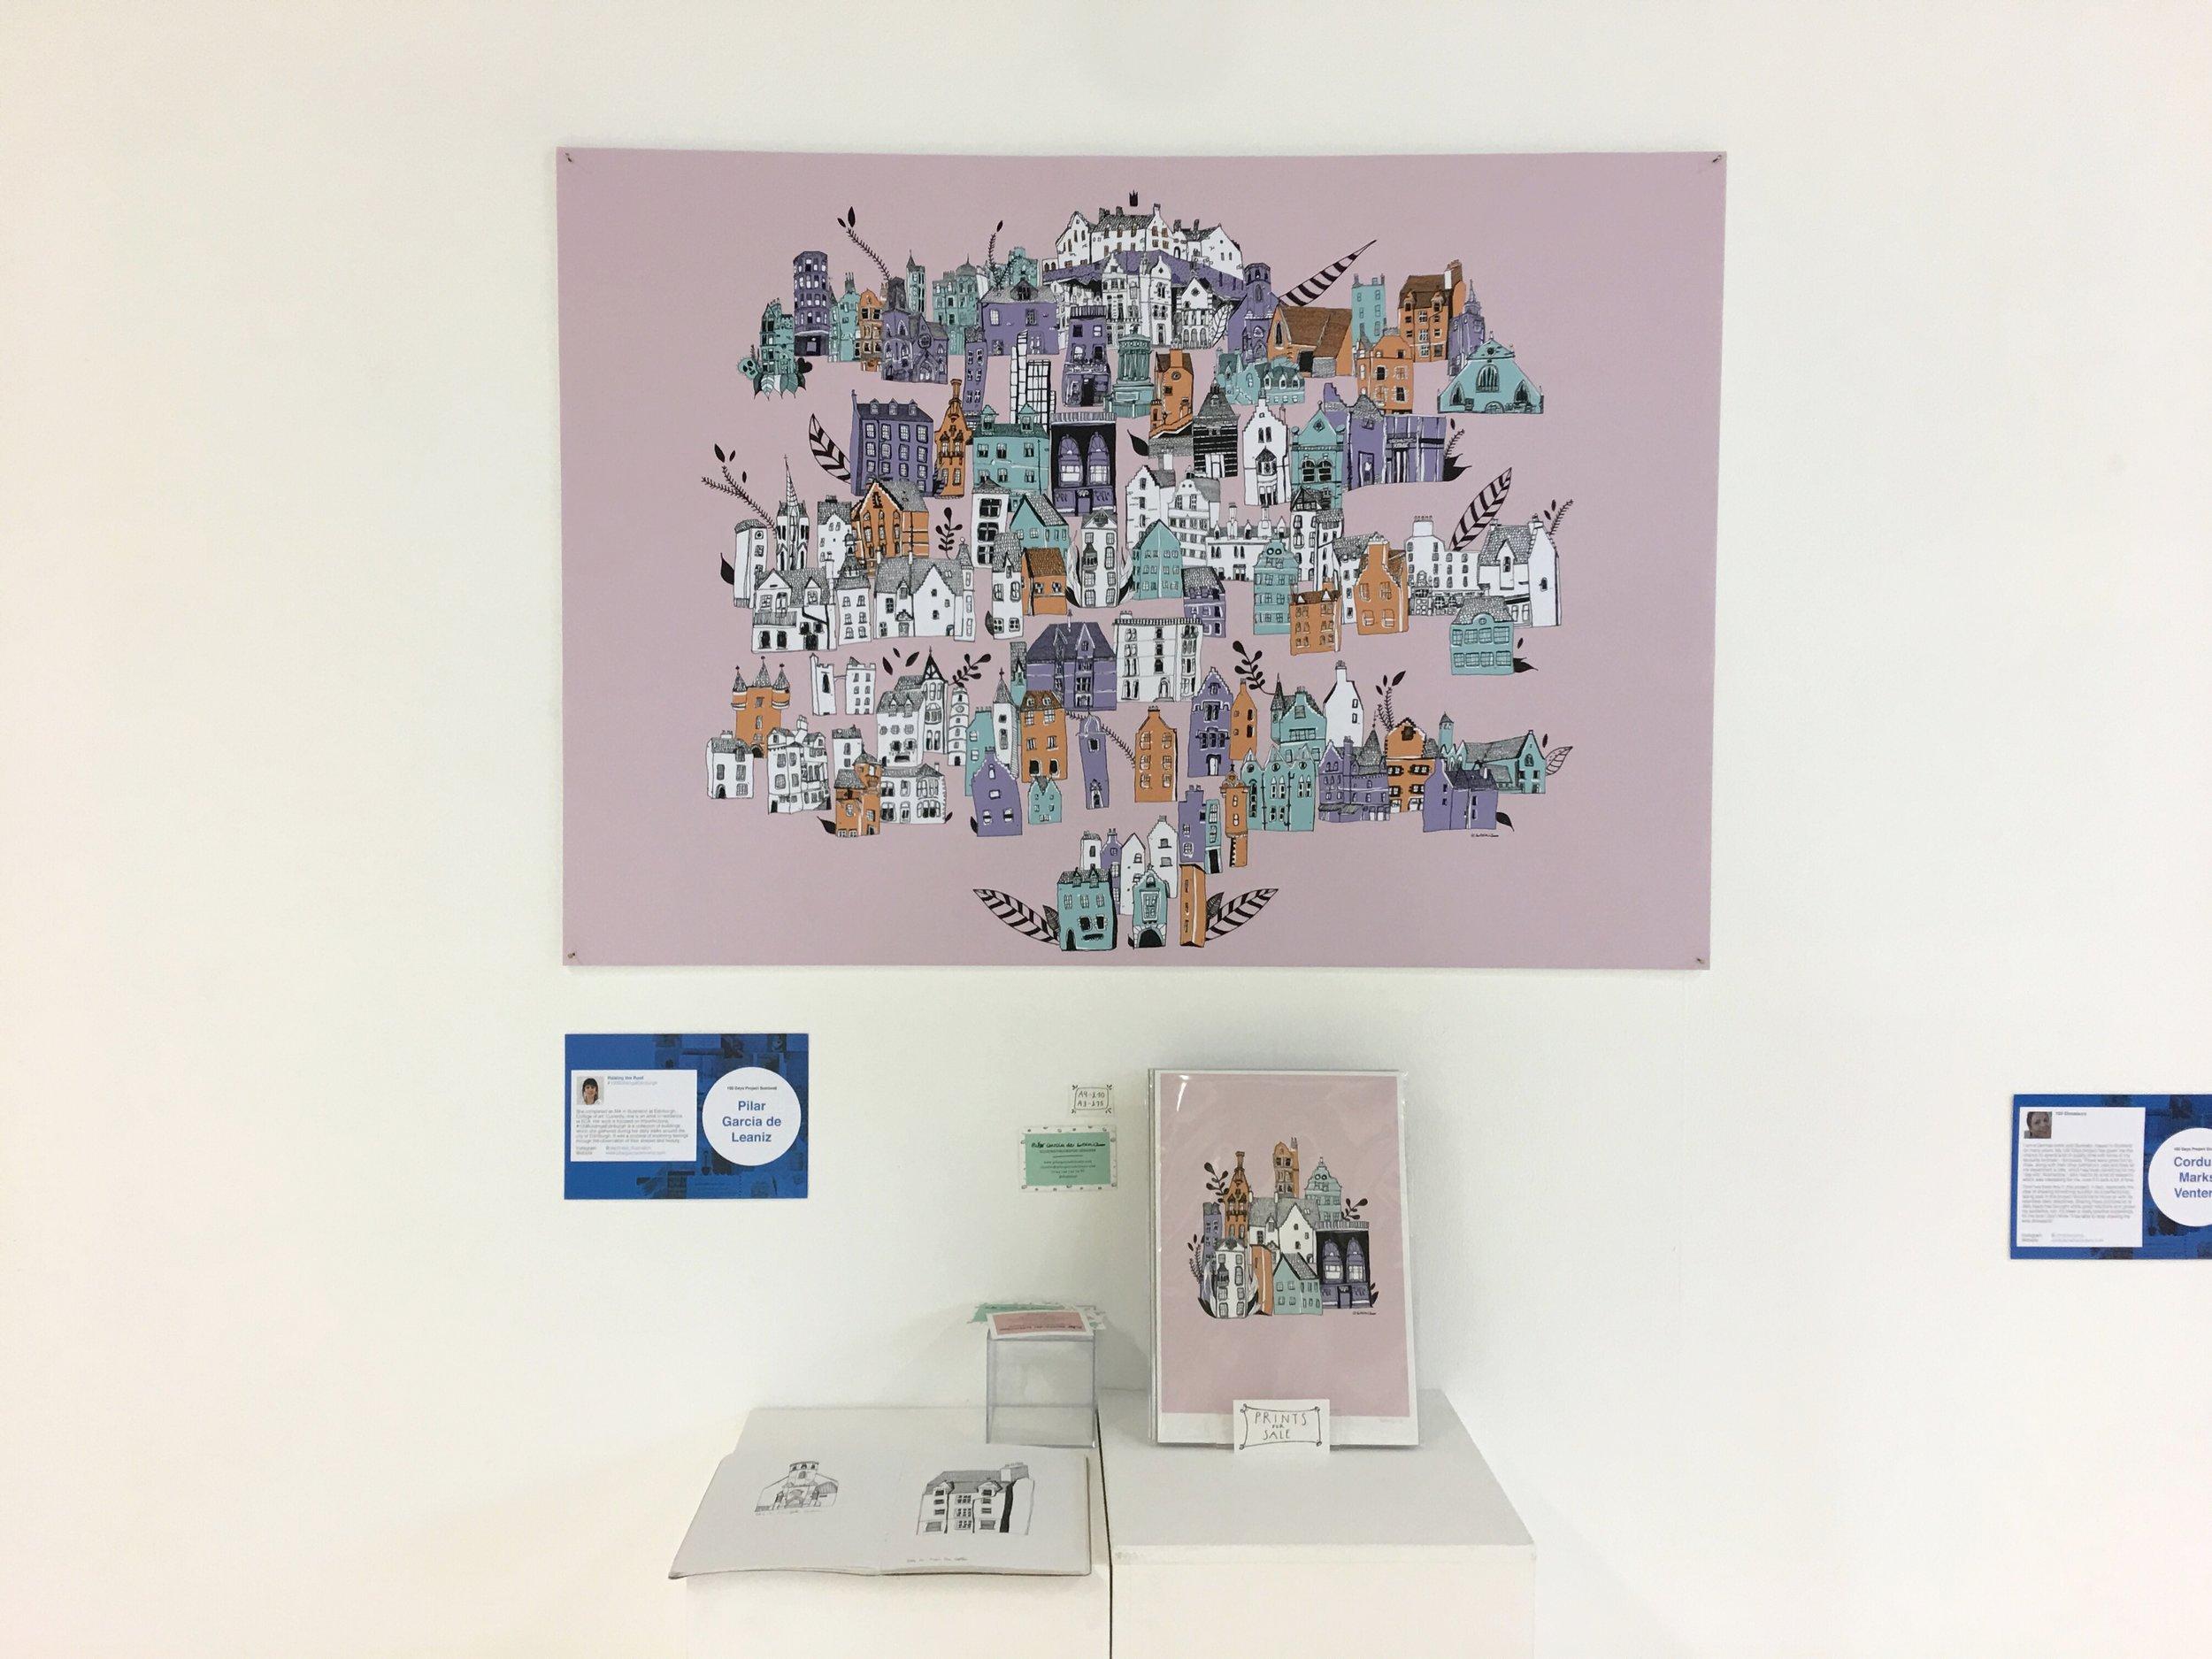 Exhibition  100 Days Project, the University of Edinburgh, 2018